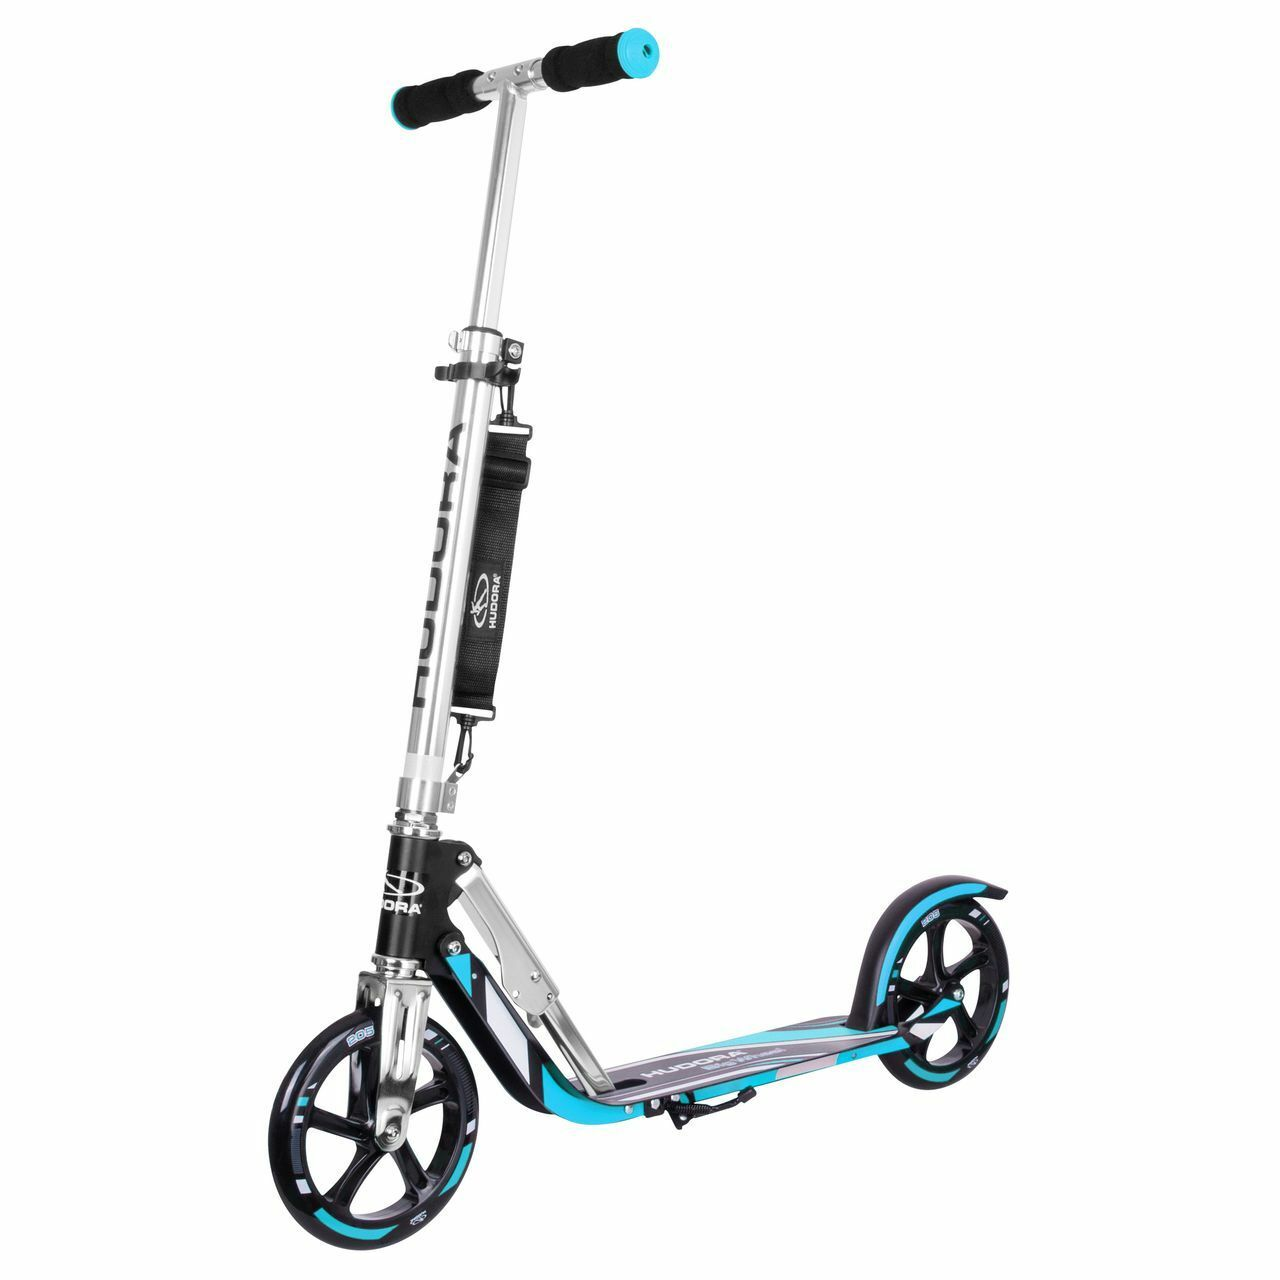 HUDORA Scooter Roller Big Wheel RX-Pro 205 schwarz-blau